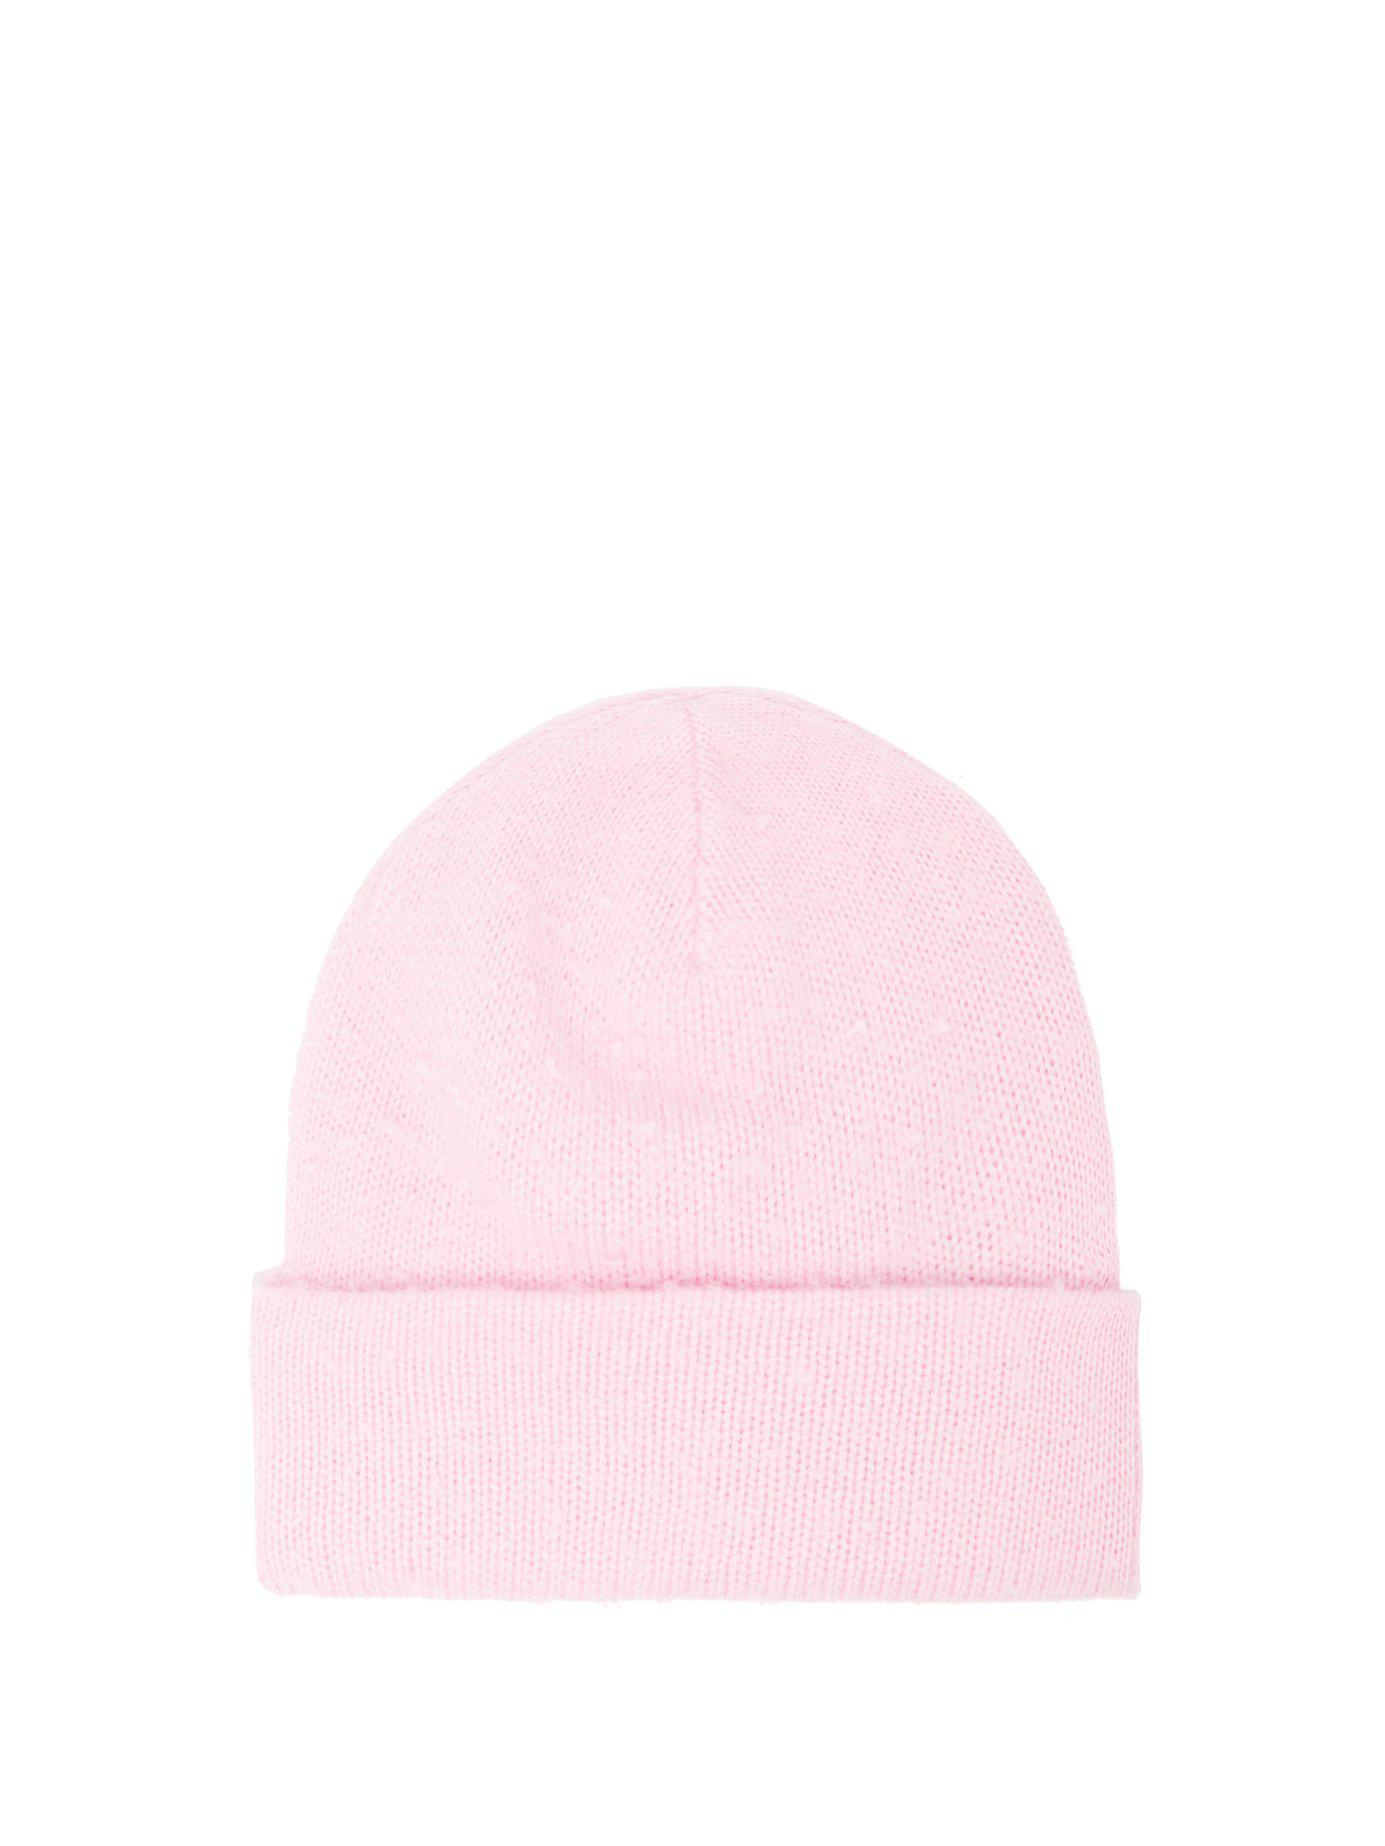 e4d3b45e54f Acne Studios Pilled Wool Blend Beanie Hat in Pink for Men - Lyst